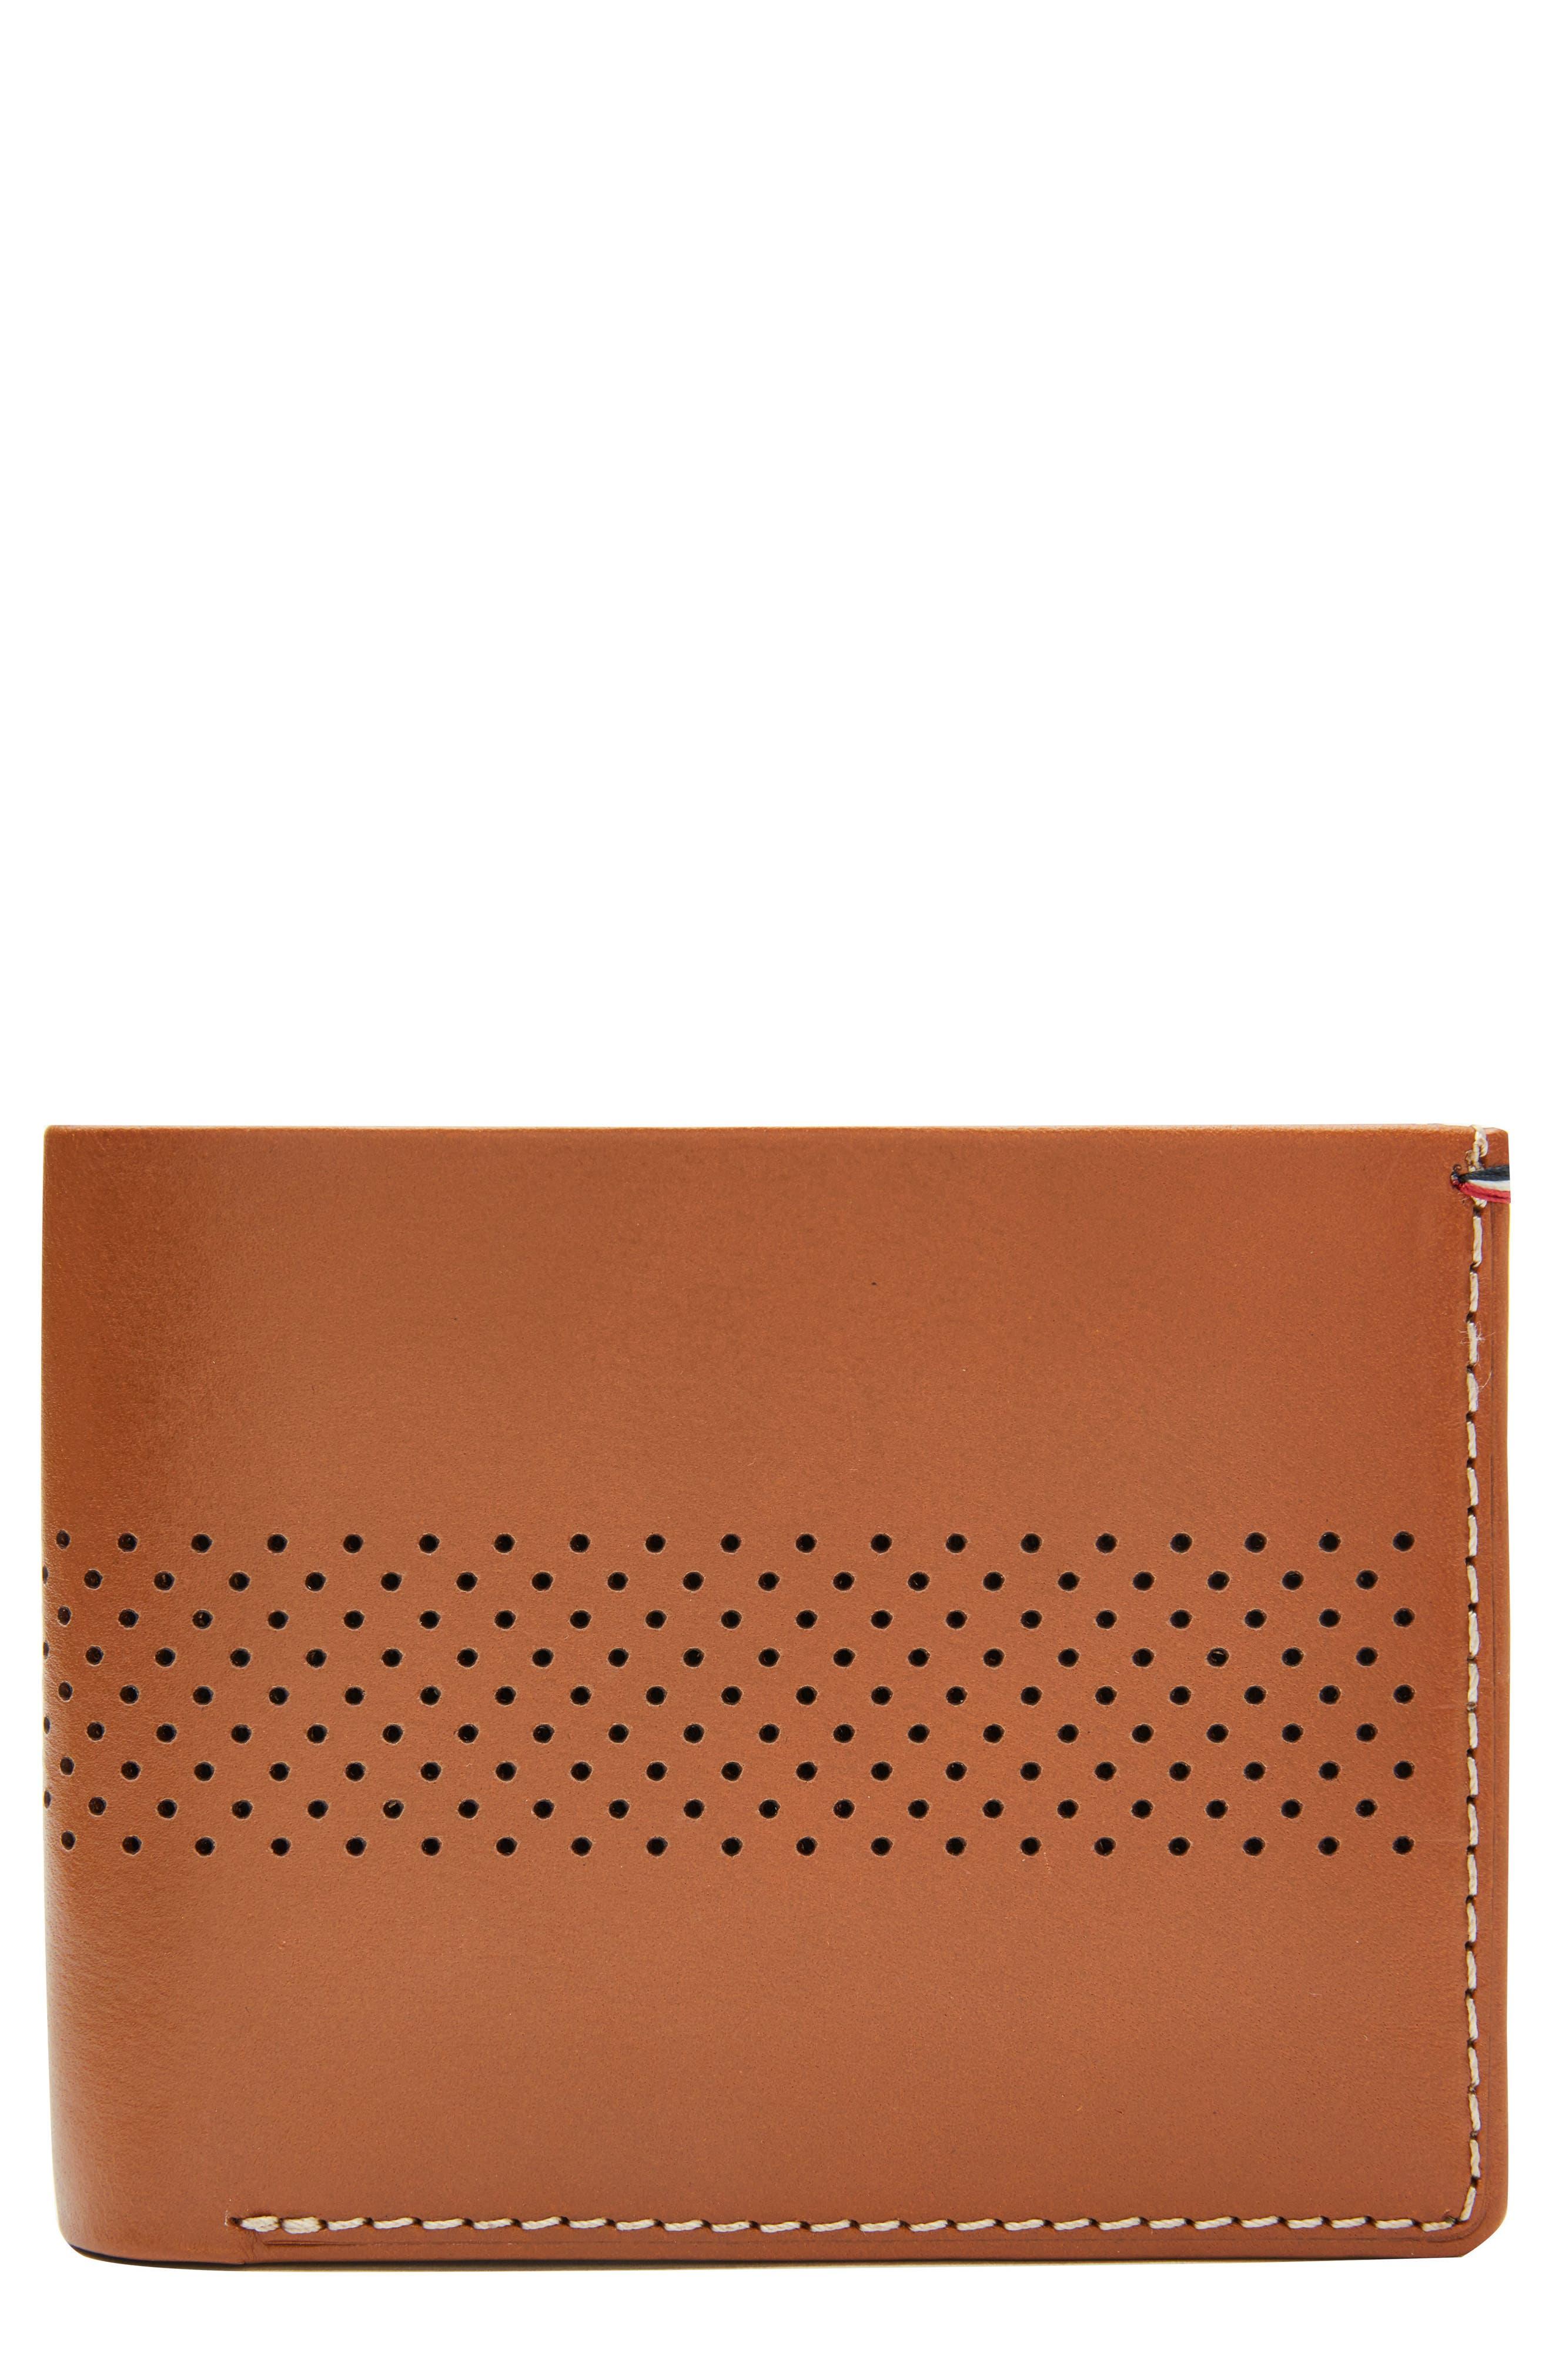 Alternate Image 1 Selected - Jack Mason Leather Wallet